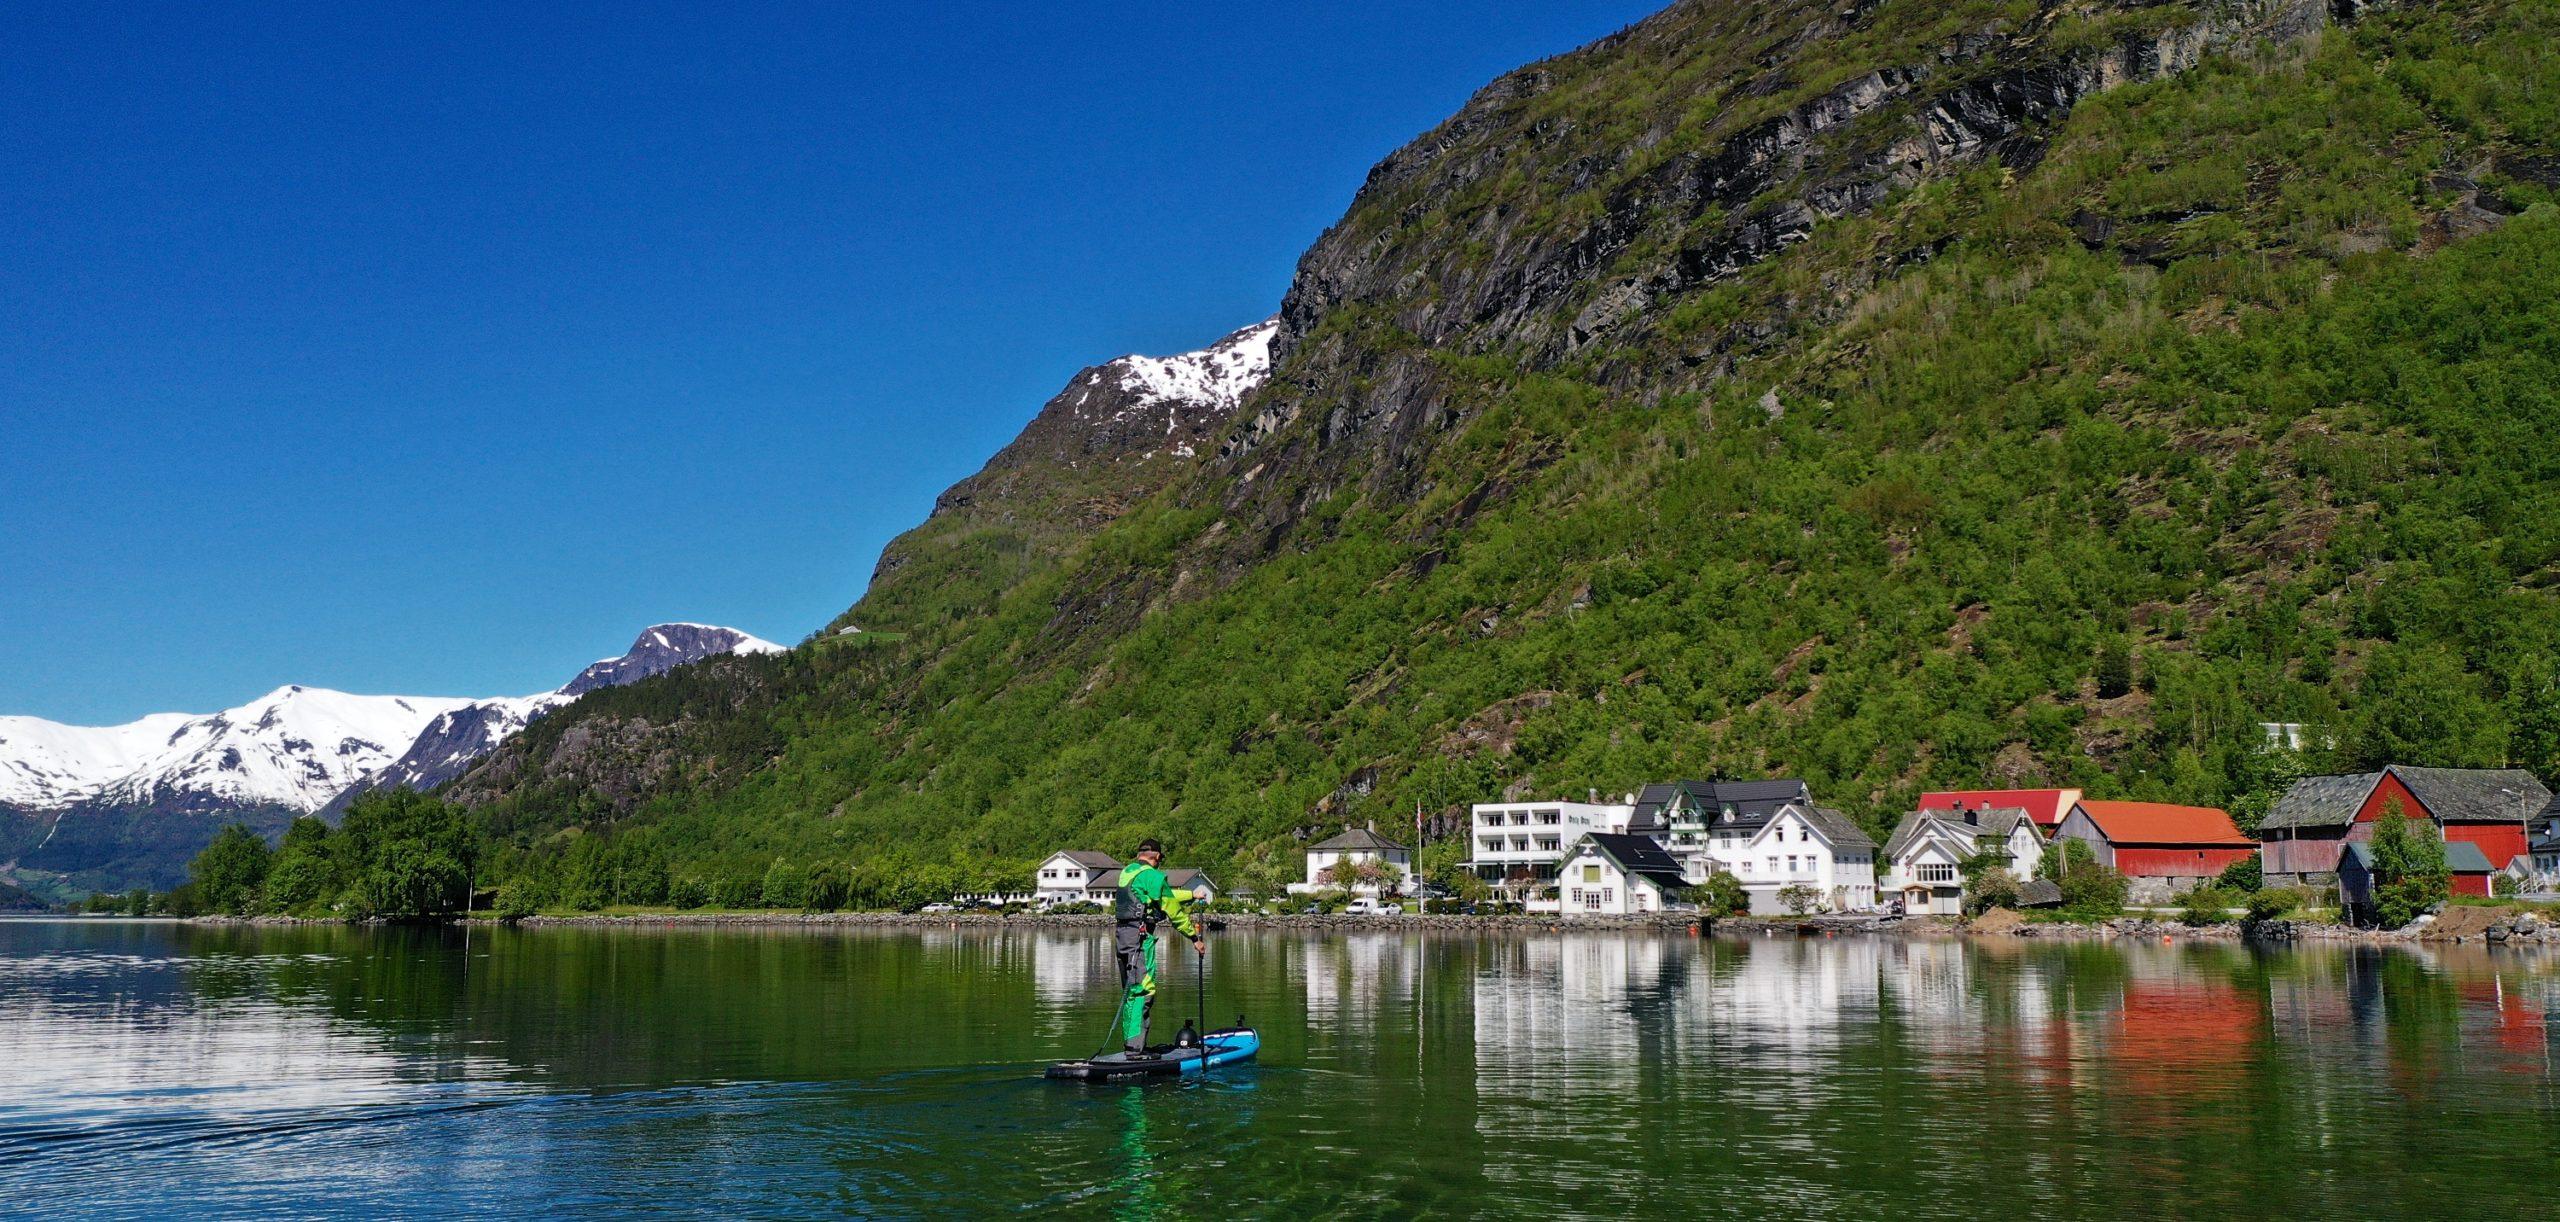 FJORDS NORWAY - Hjelle at Oppstryn in Nordfjord